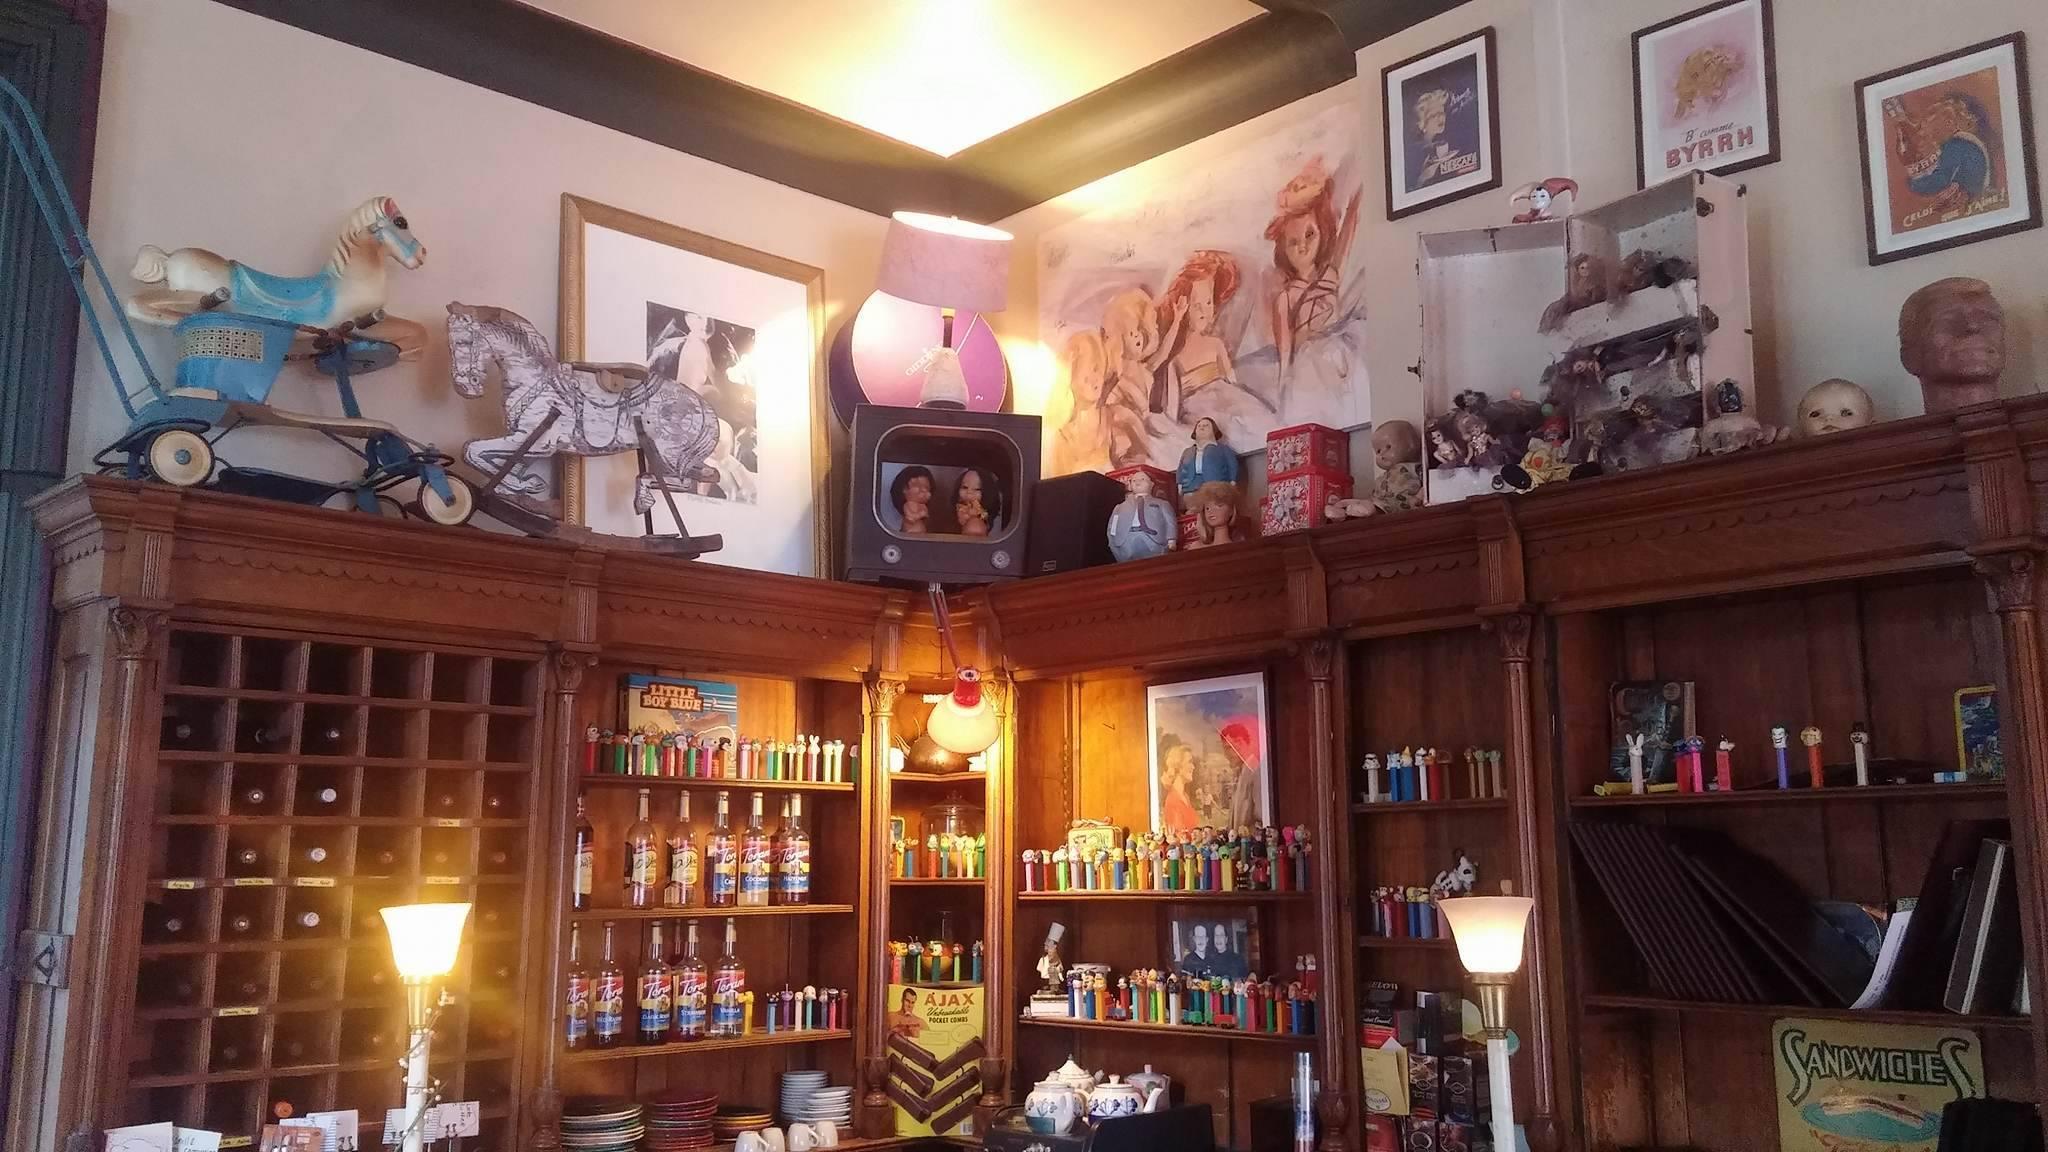 The York Street Cafe